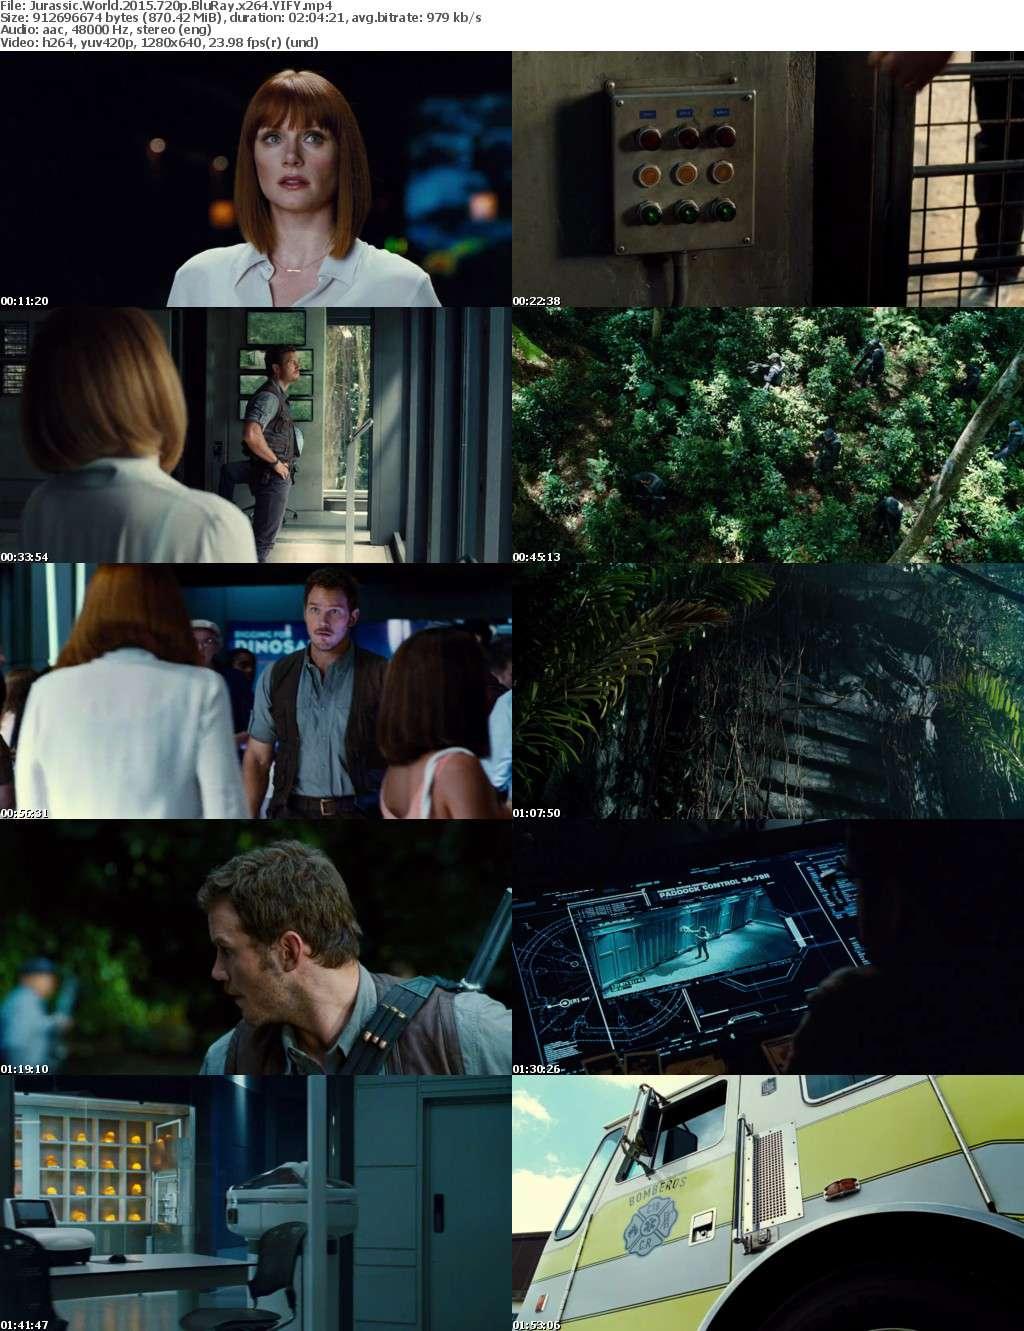 Jurassic World (2015) [BluRay] [720p] YIFY